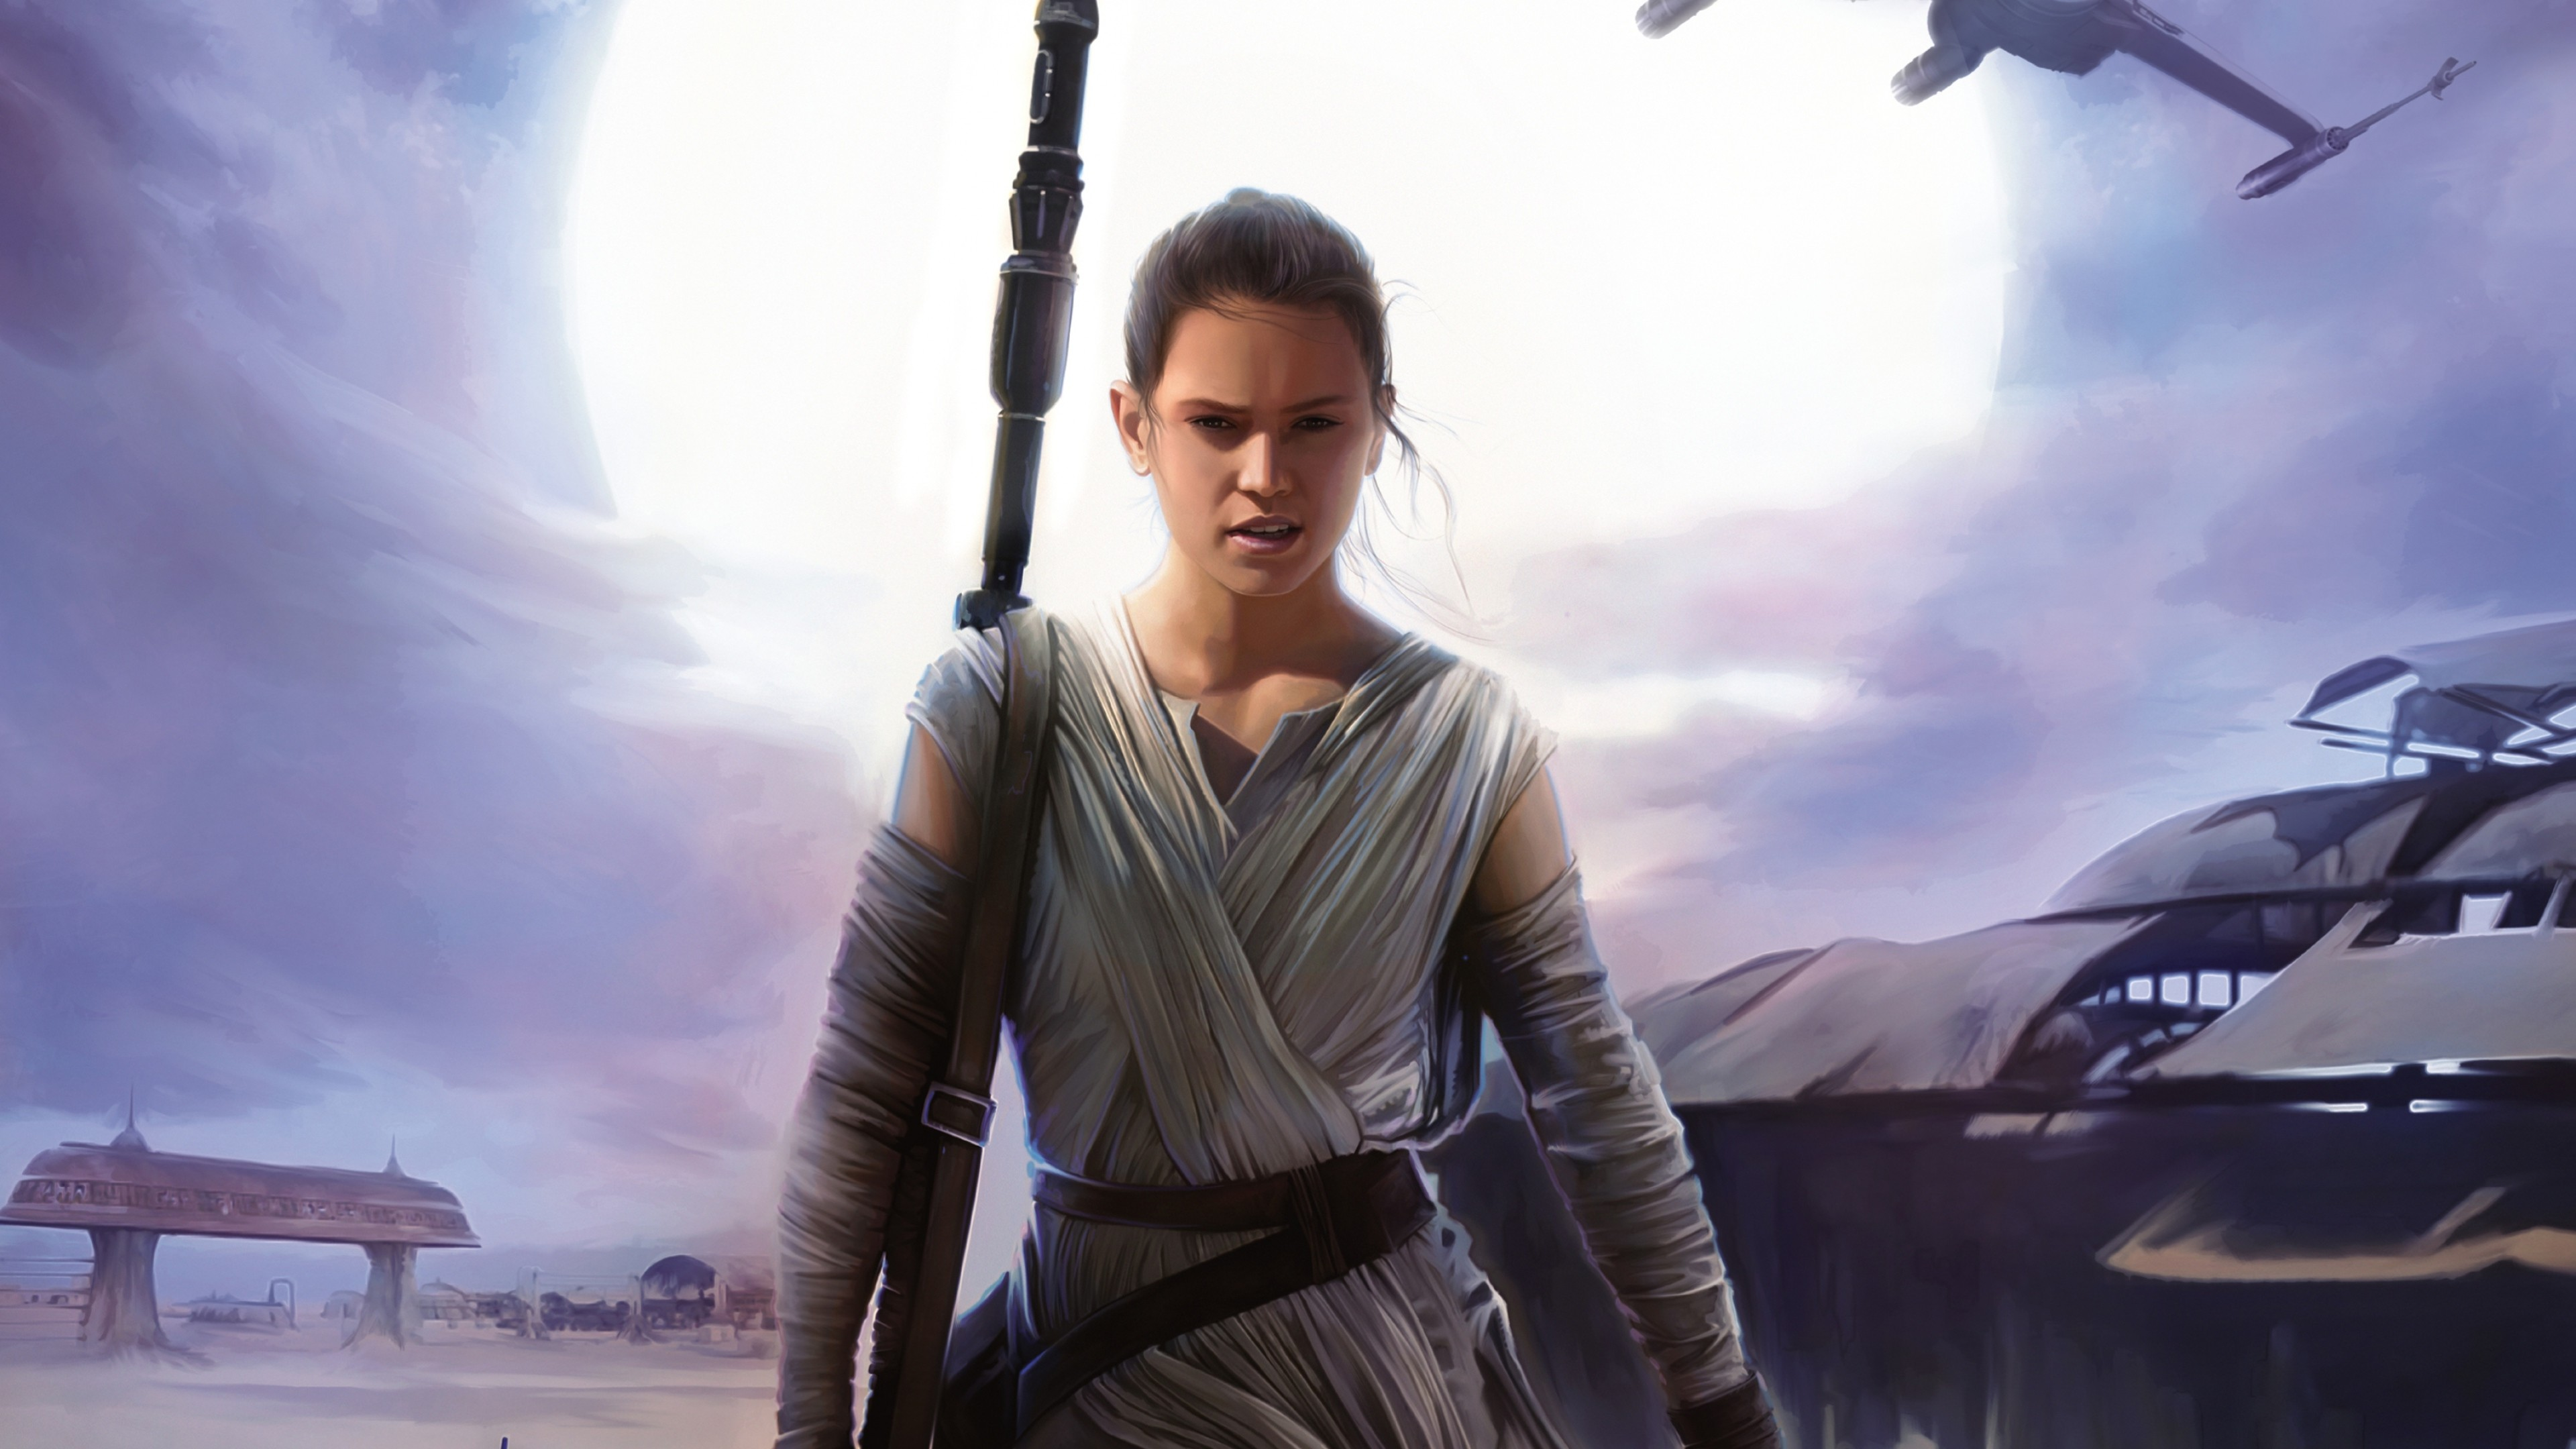 star wars episode vii the force awakens daisy ridley Star Wars HD Desktop  Wallpapers for Widescreen